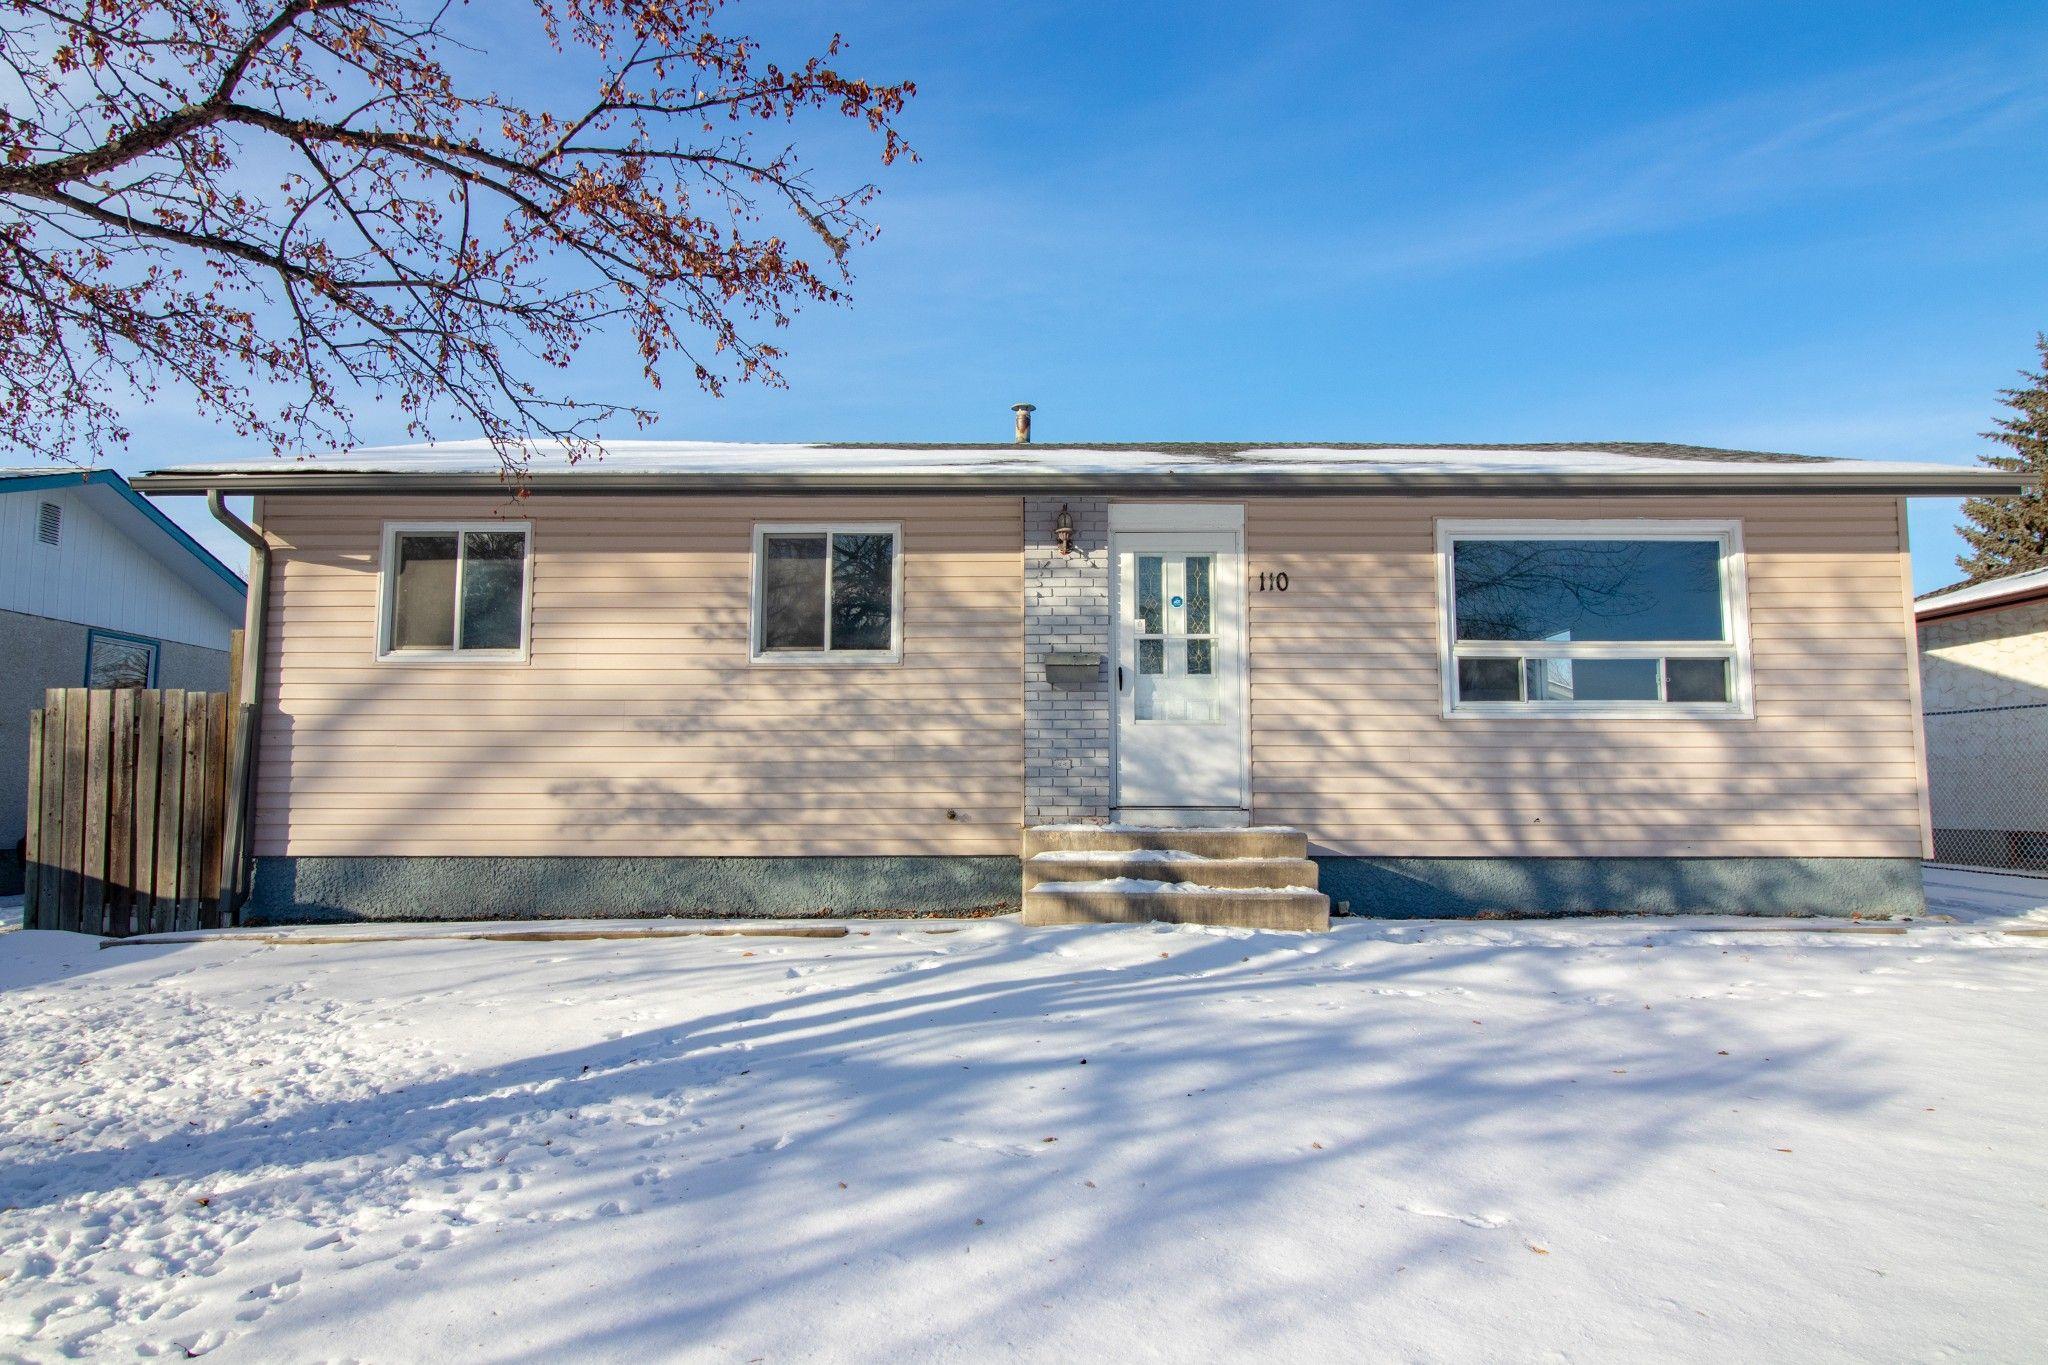 Main Photo: 110 Kushner Crescent in Winnipeg: Single Family Detached for sale (4H)  : MLS®# 201933144